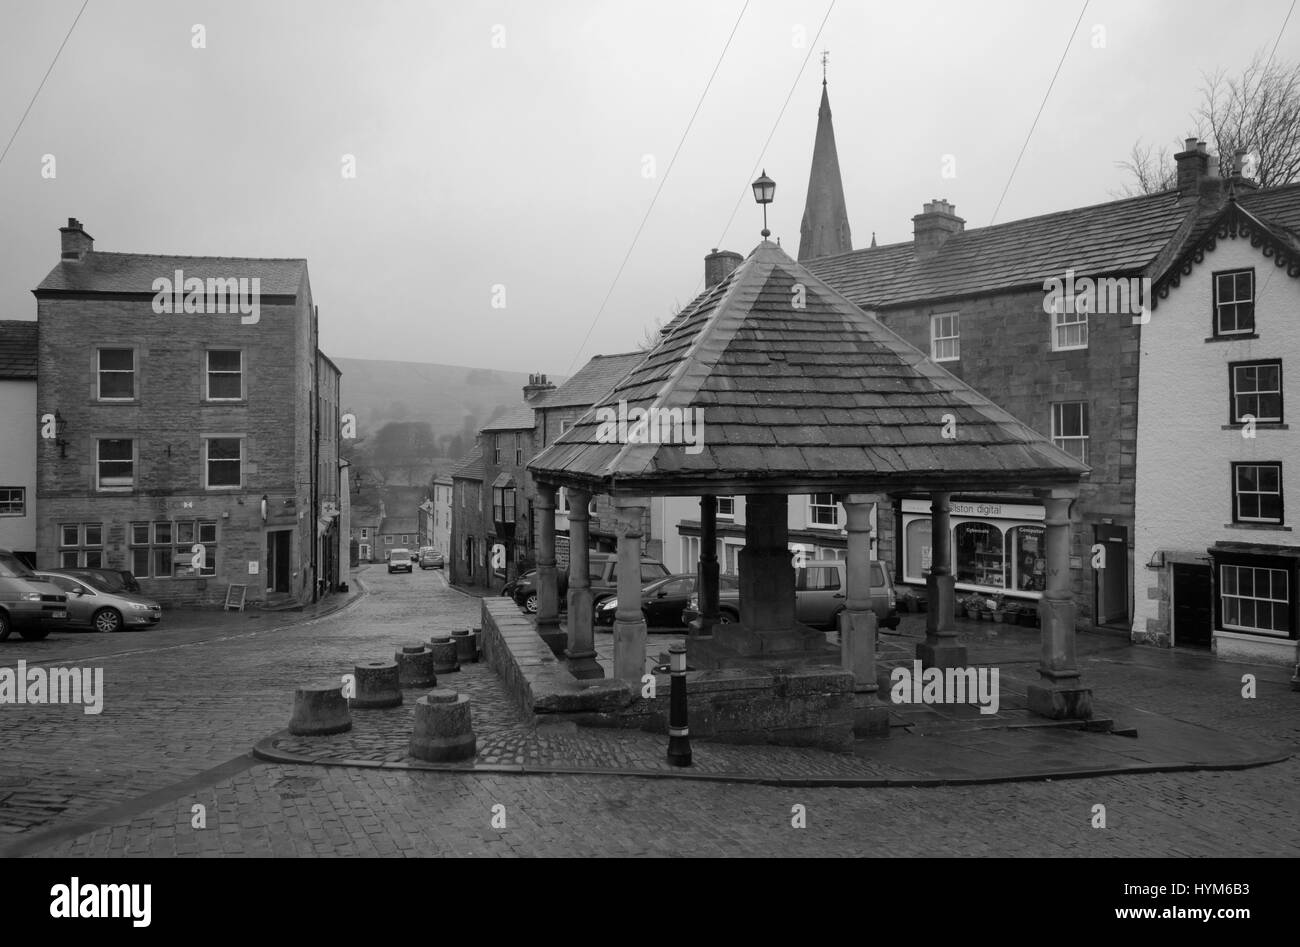 Alston town centre - Stock Image